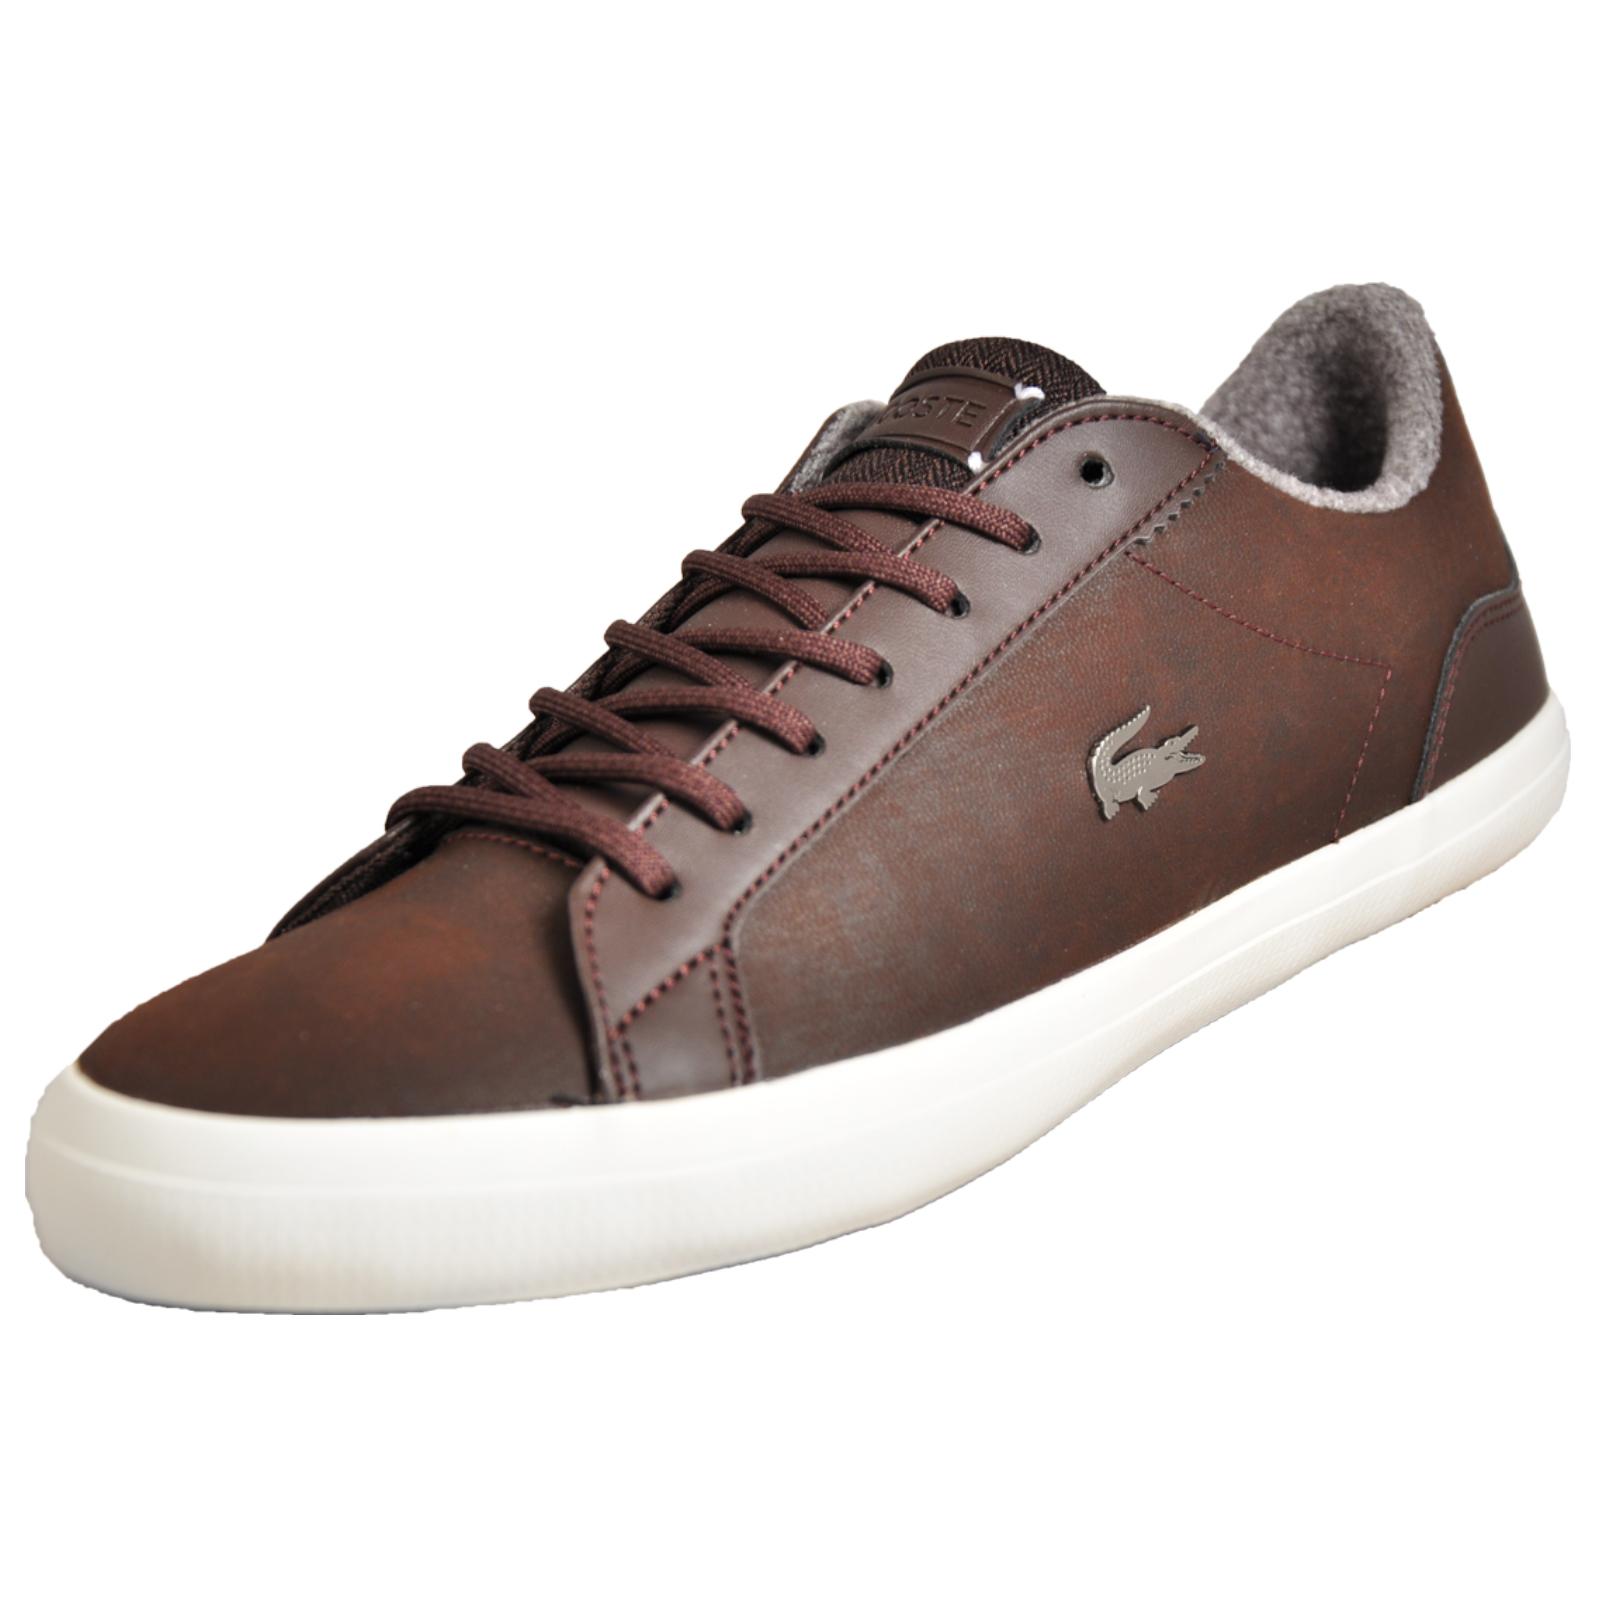 a11b303f42d42d Details about Lacoste Lerond 318 Men s Leather Classic Casual Retro  Designer Trainers Brown B